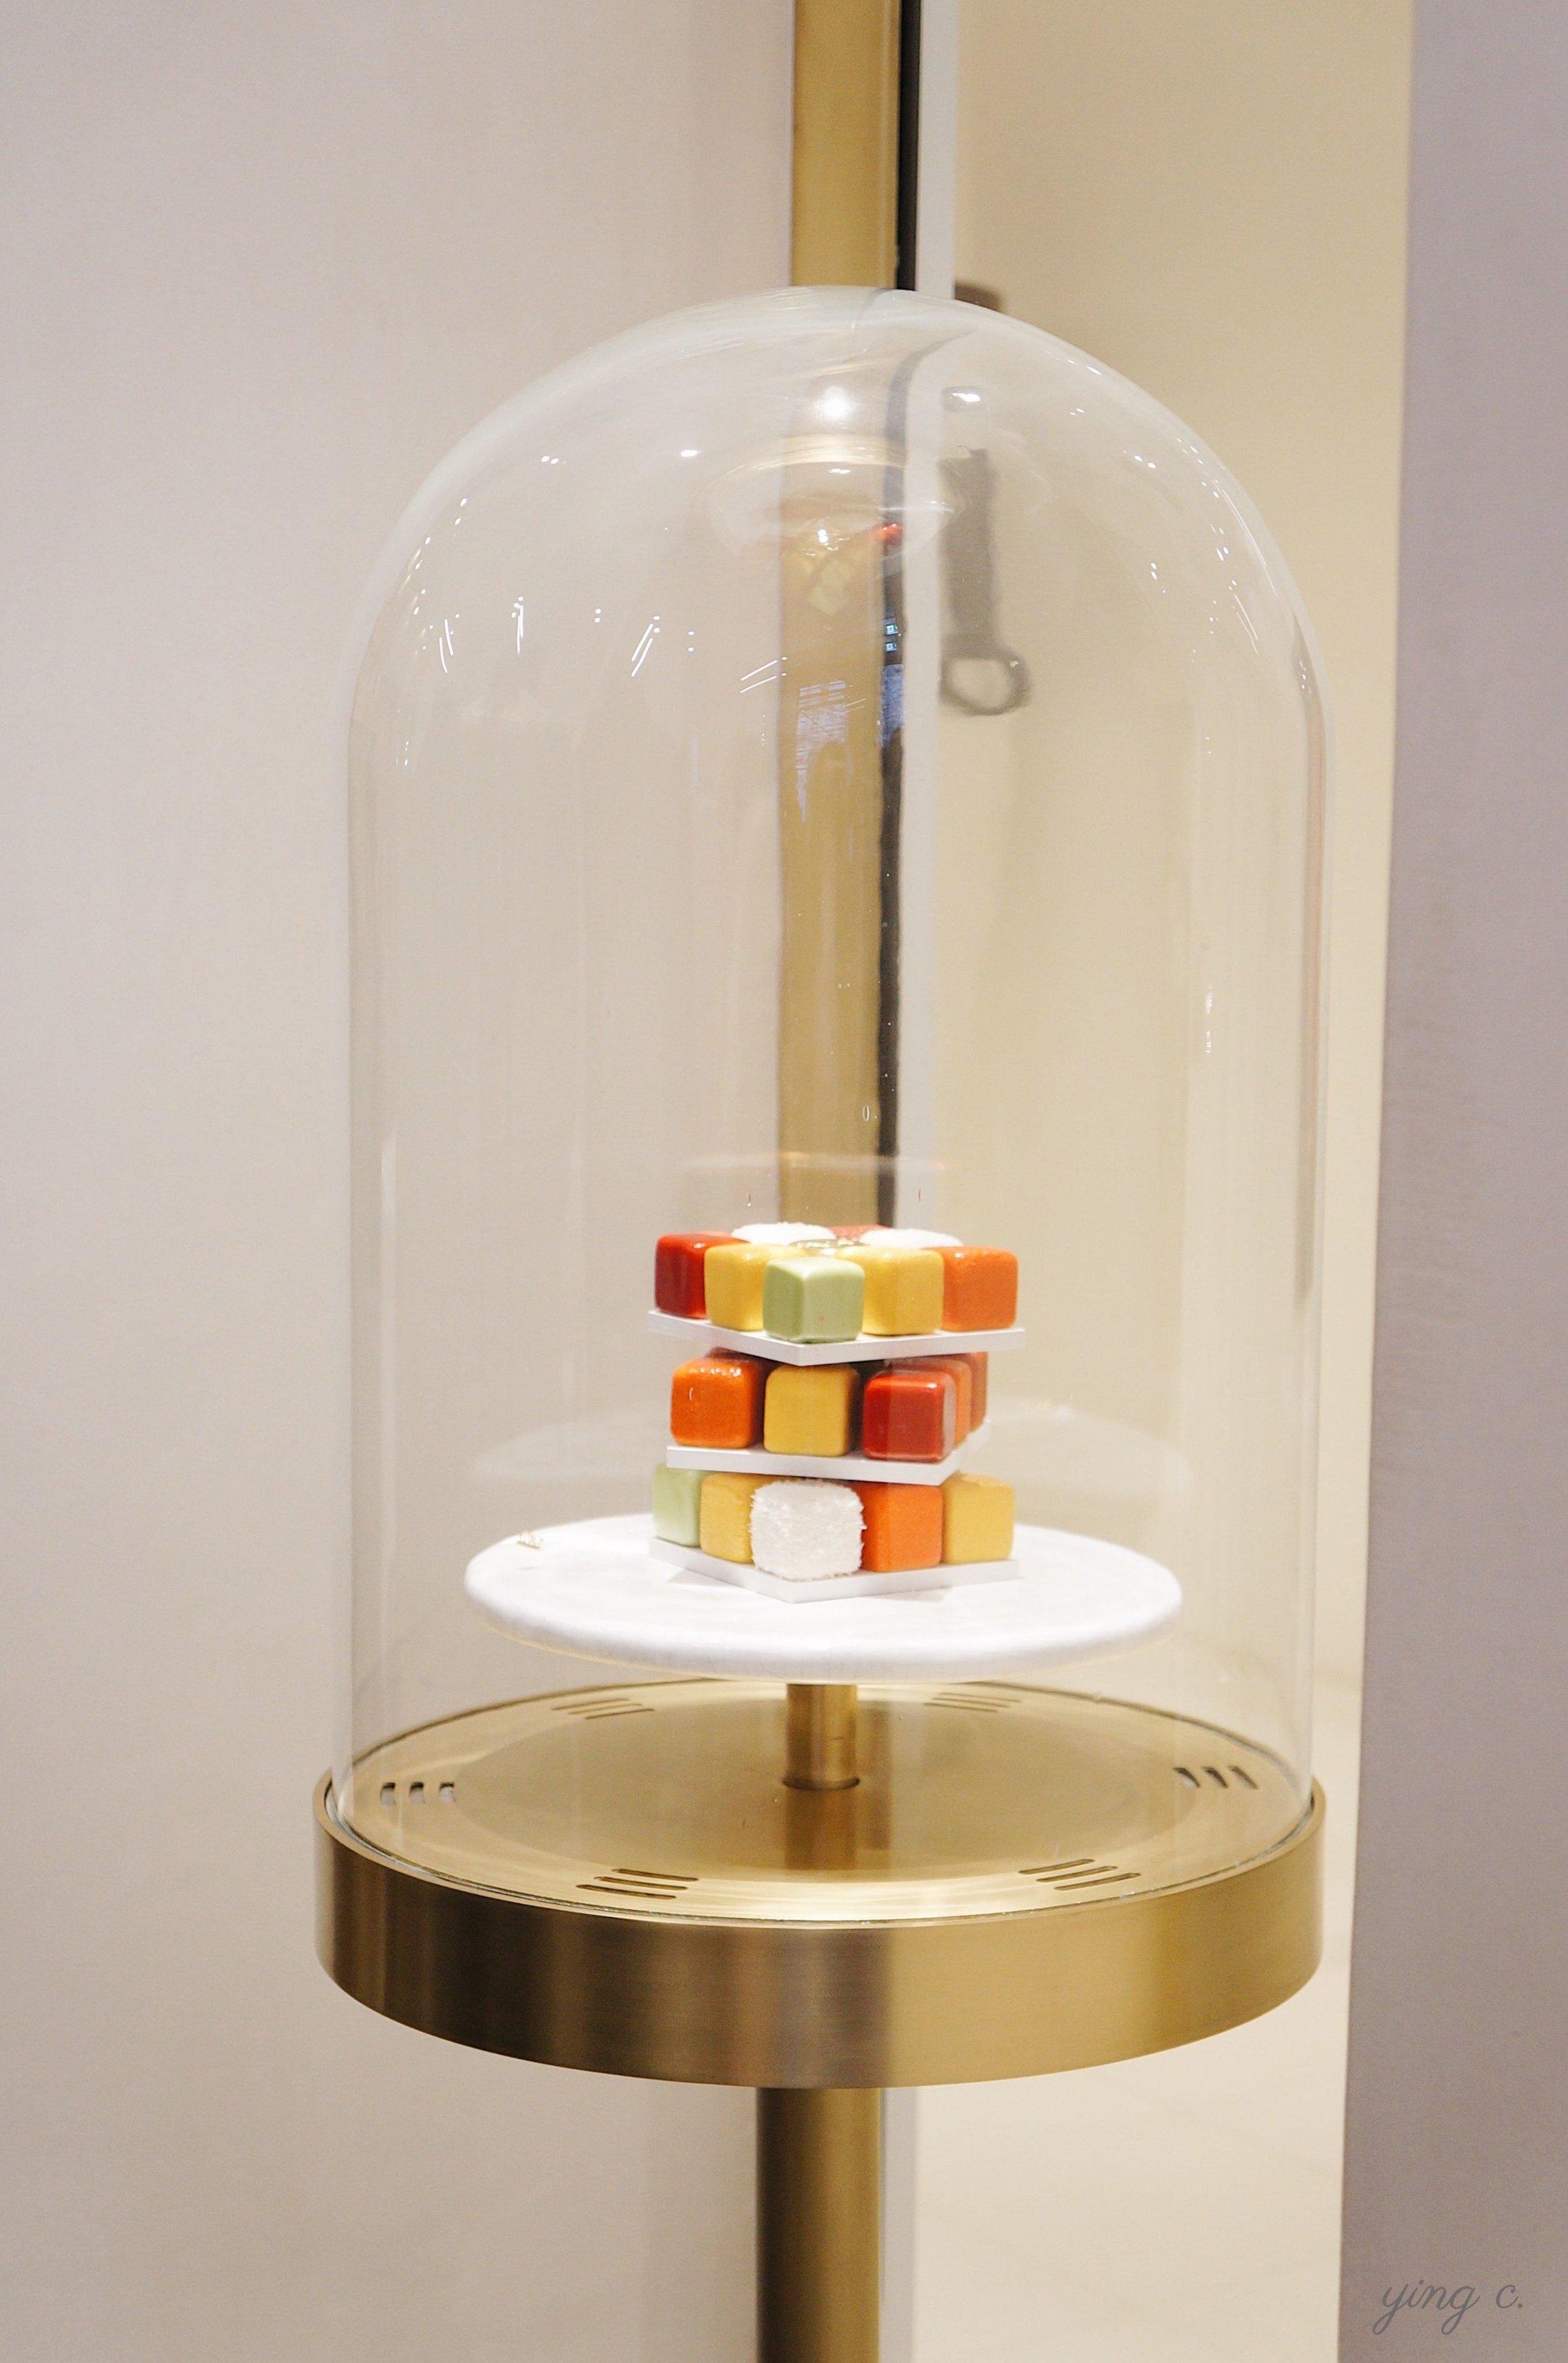 Cédric主廚的招牌作品之一——Rubik's Cube / 魔術方塊。